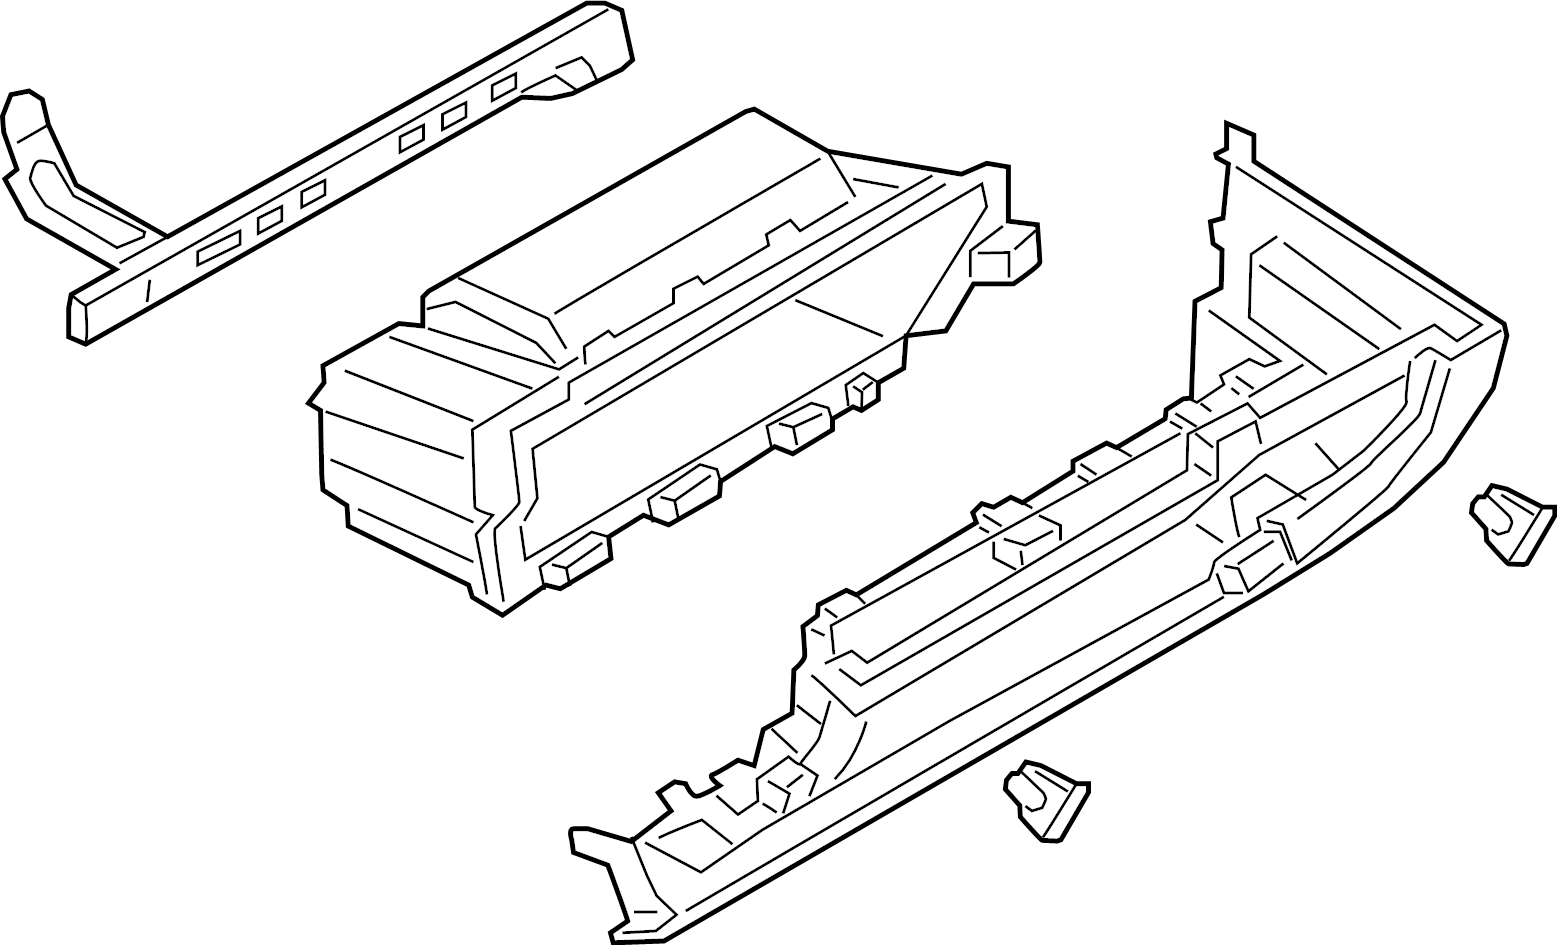 Mazda 3 Glove Box Assembly. MEXICO BUILT. PANEL